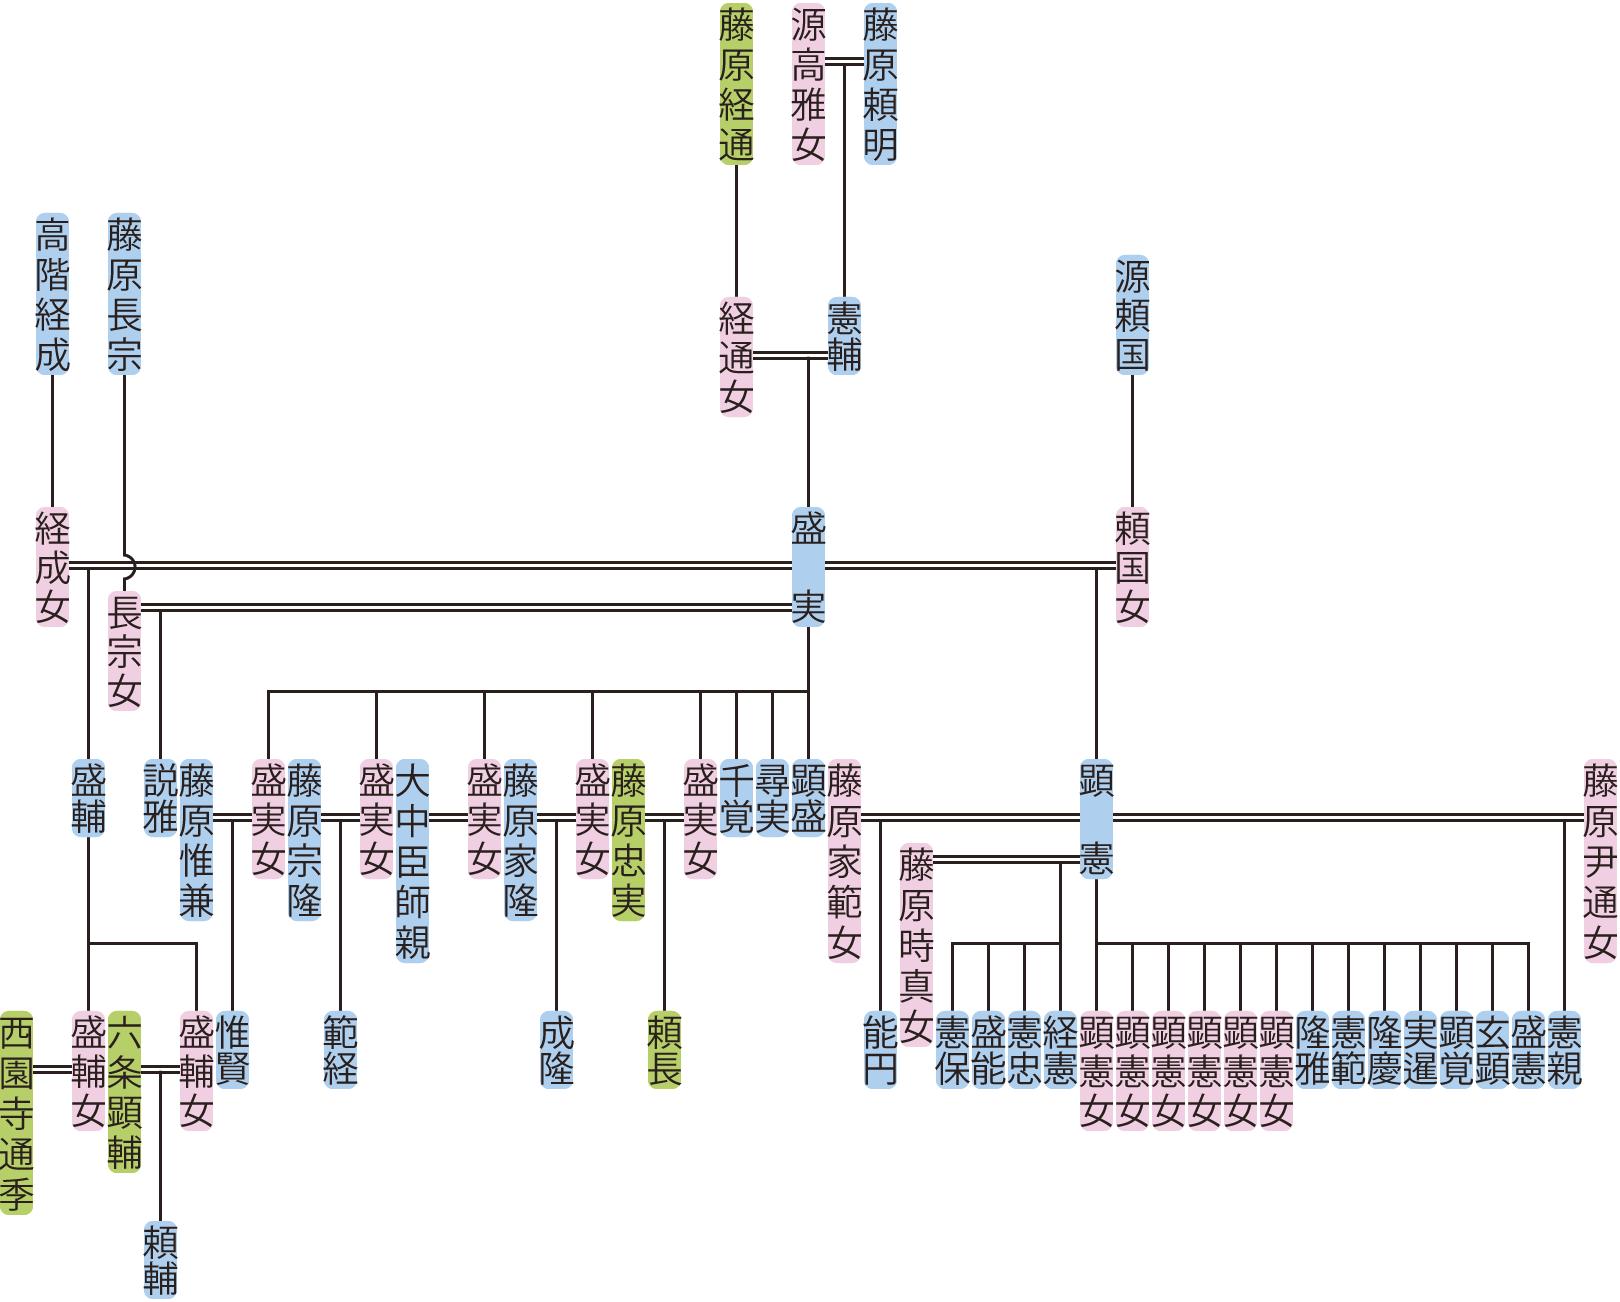 藤原盛実の系図